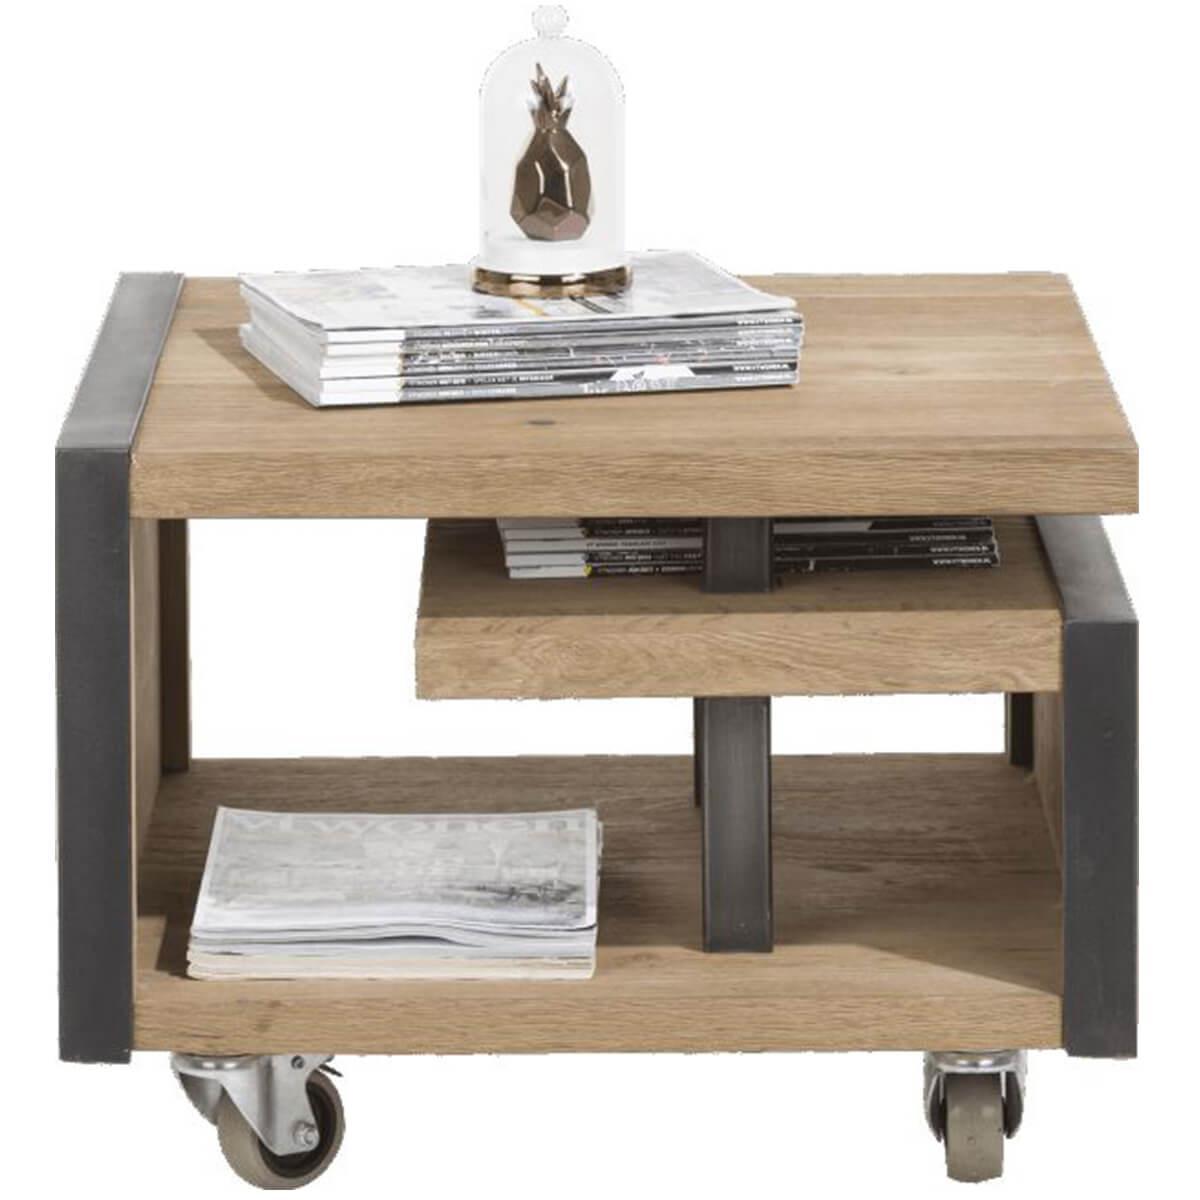 Table d'appoint METALO HetH 60x60cm